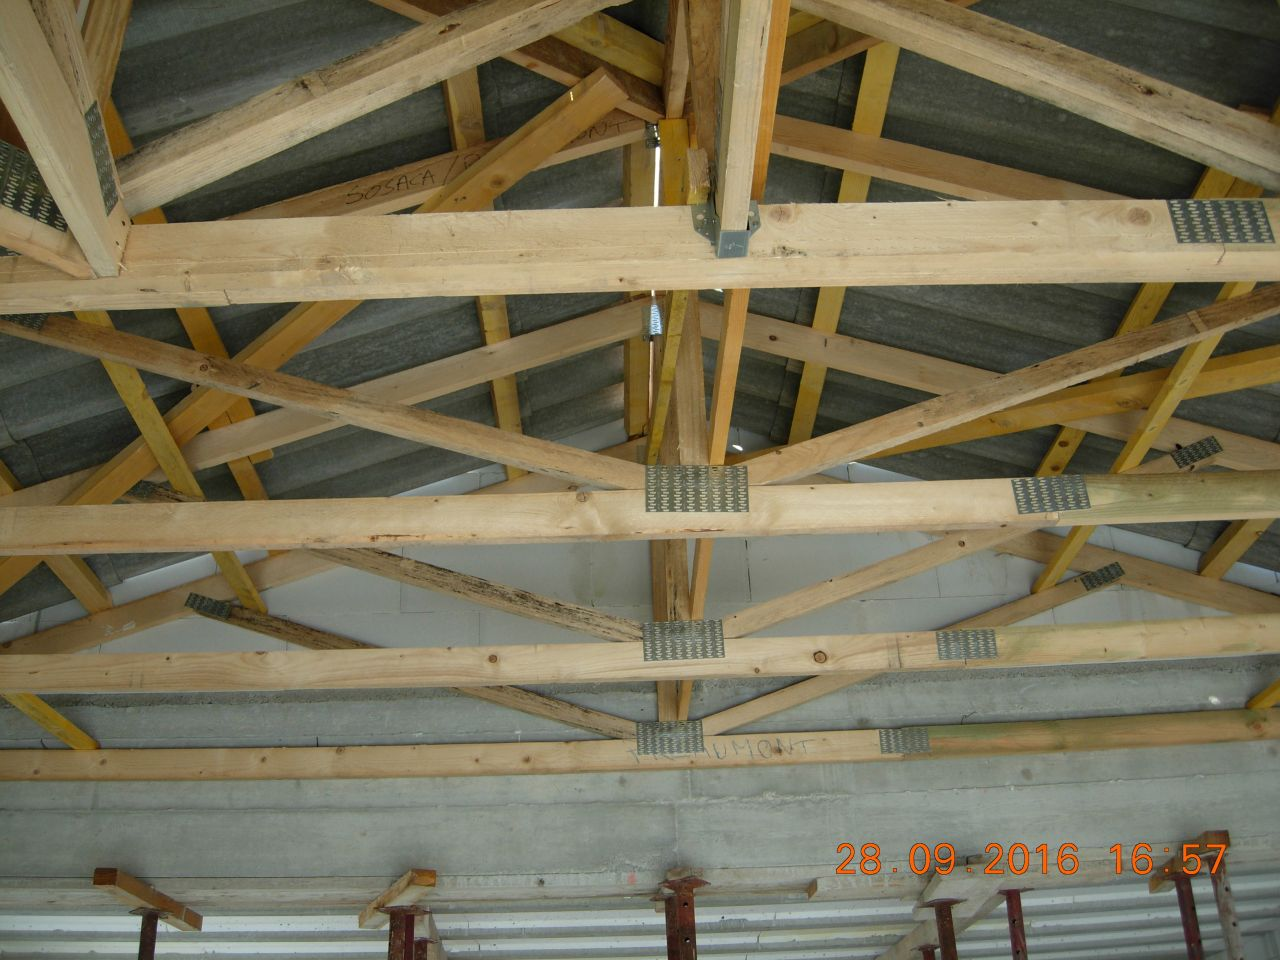 Ferraillage fondation ca bosse vide sanitaire termin var - Changer toiture fibro ciment ...